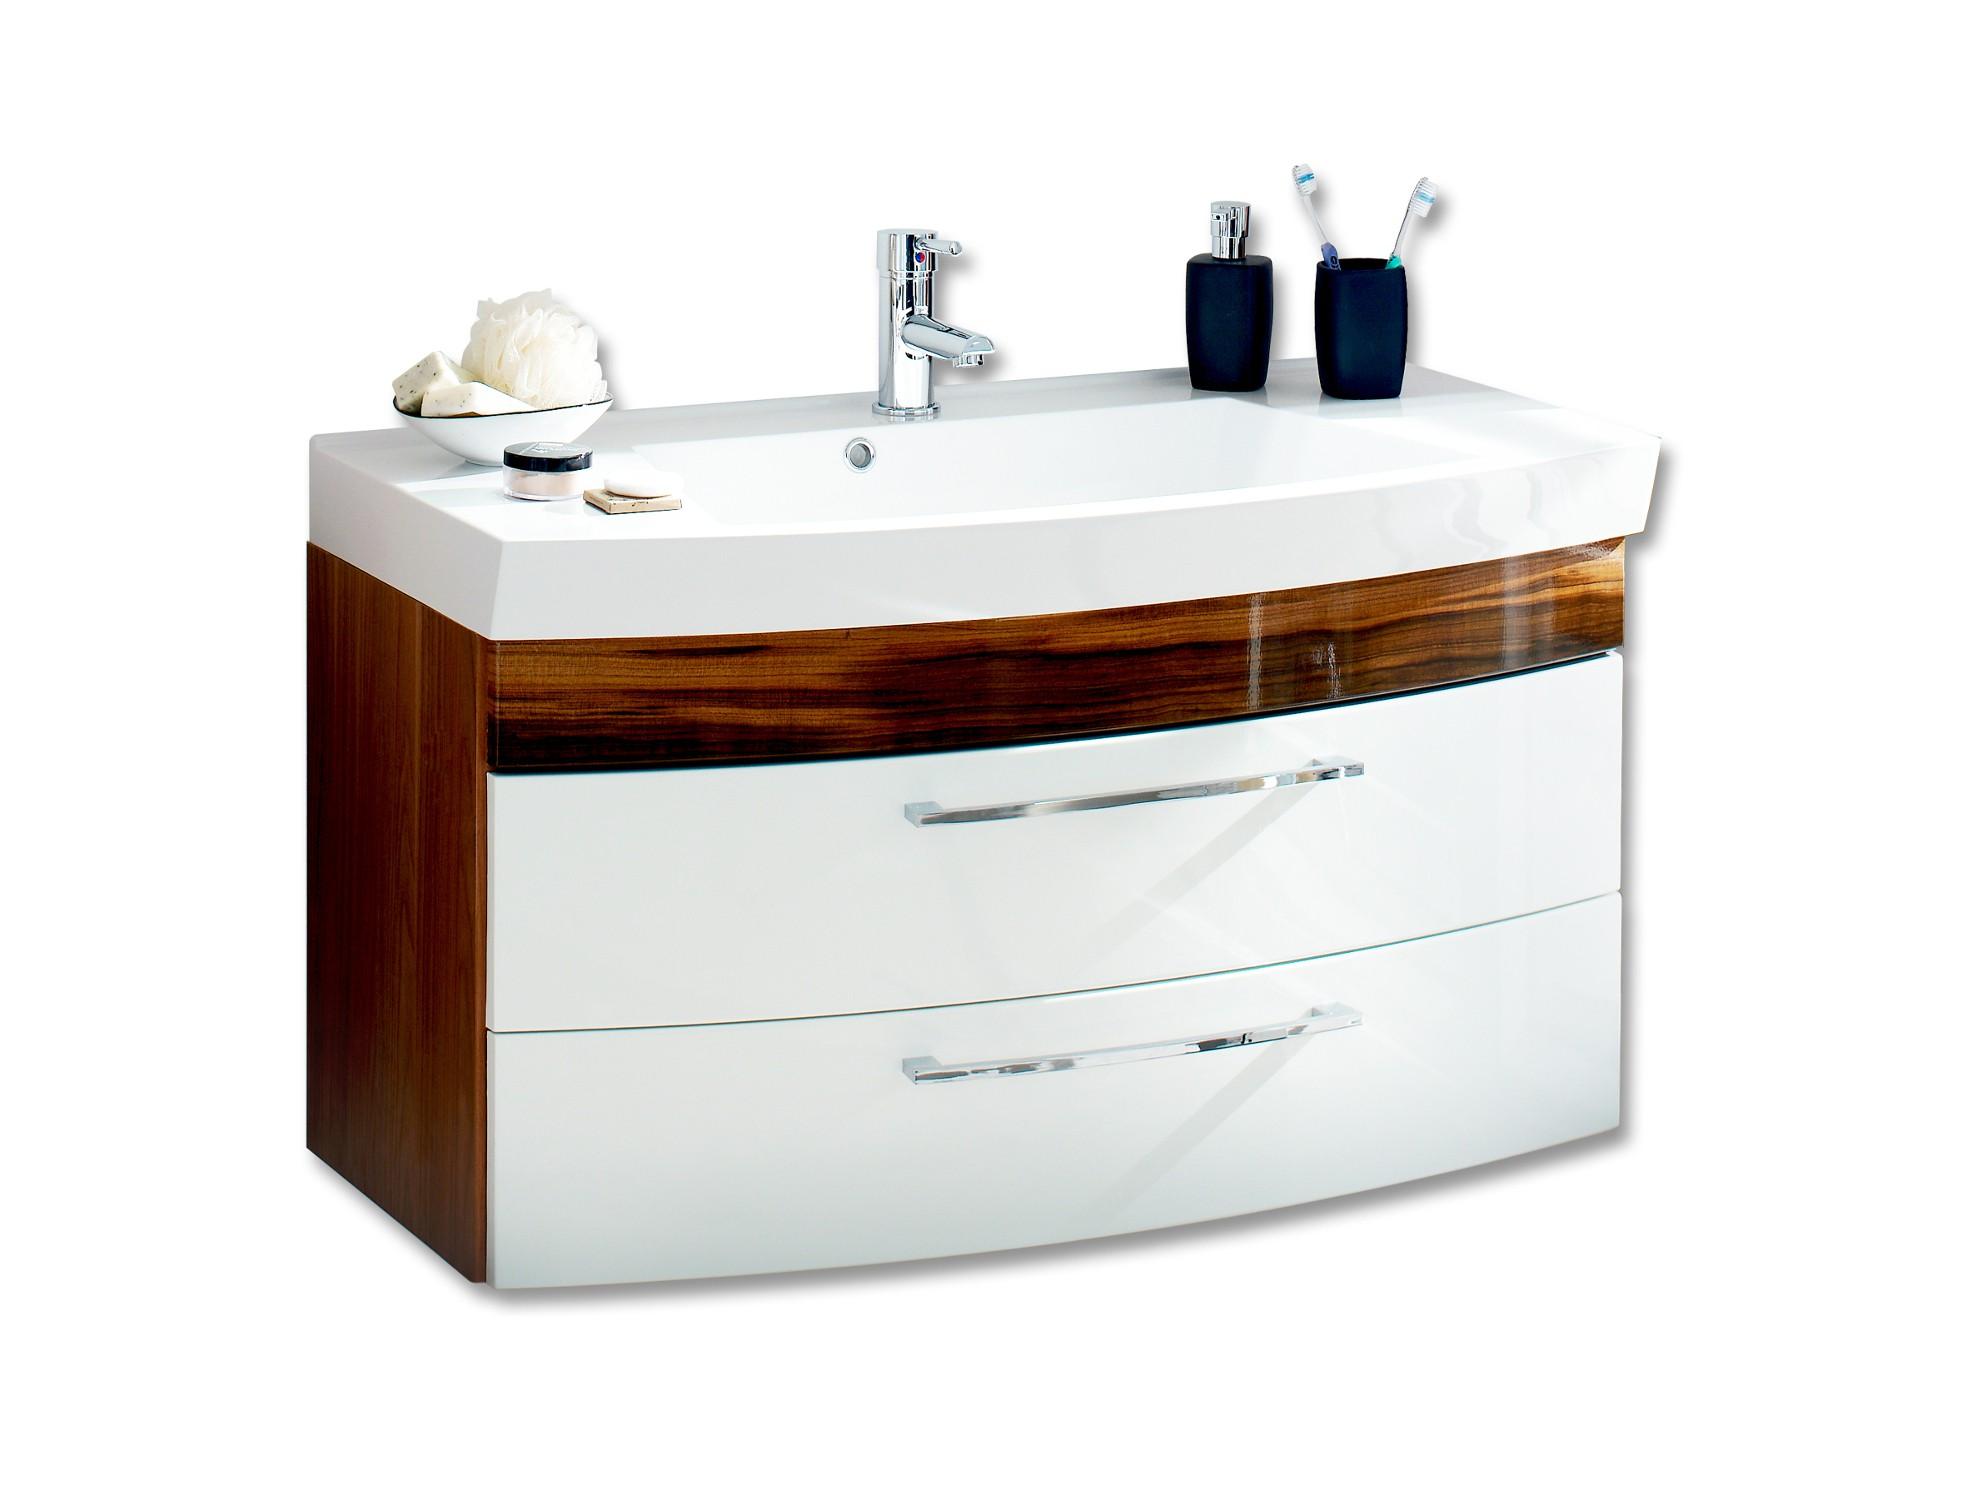 badm bel set rima i mit waschtisch 5 teilig 140 cm breit wei walnuss bad badm belsets. Black Bedroom Furniture Sets. Home Design Ideas